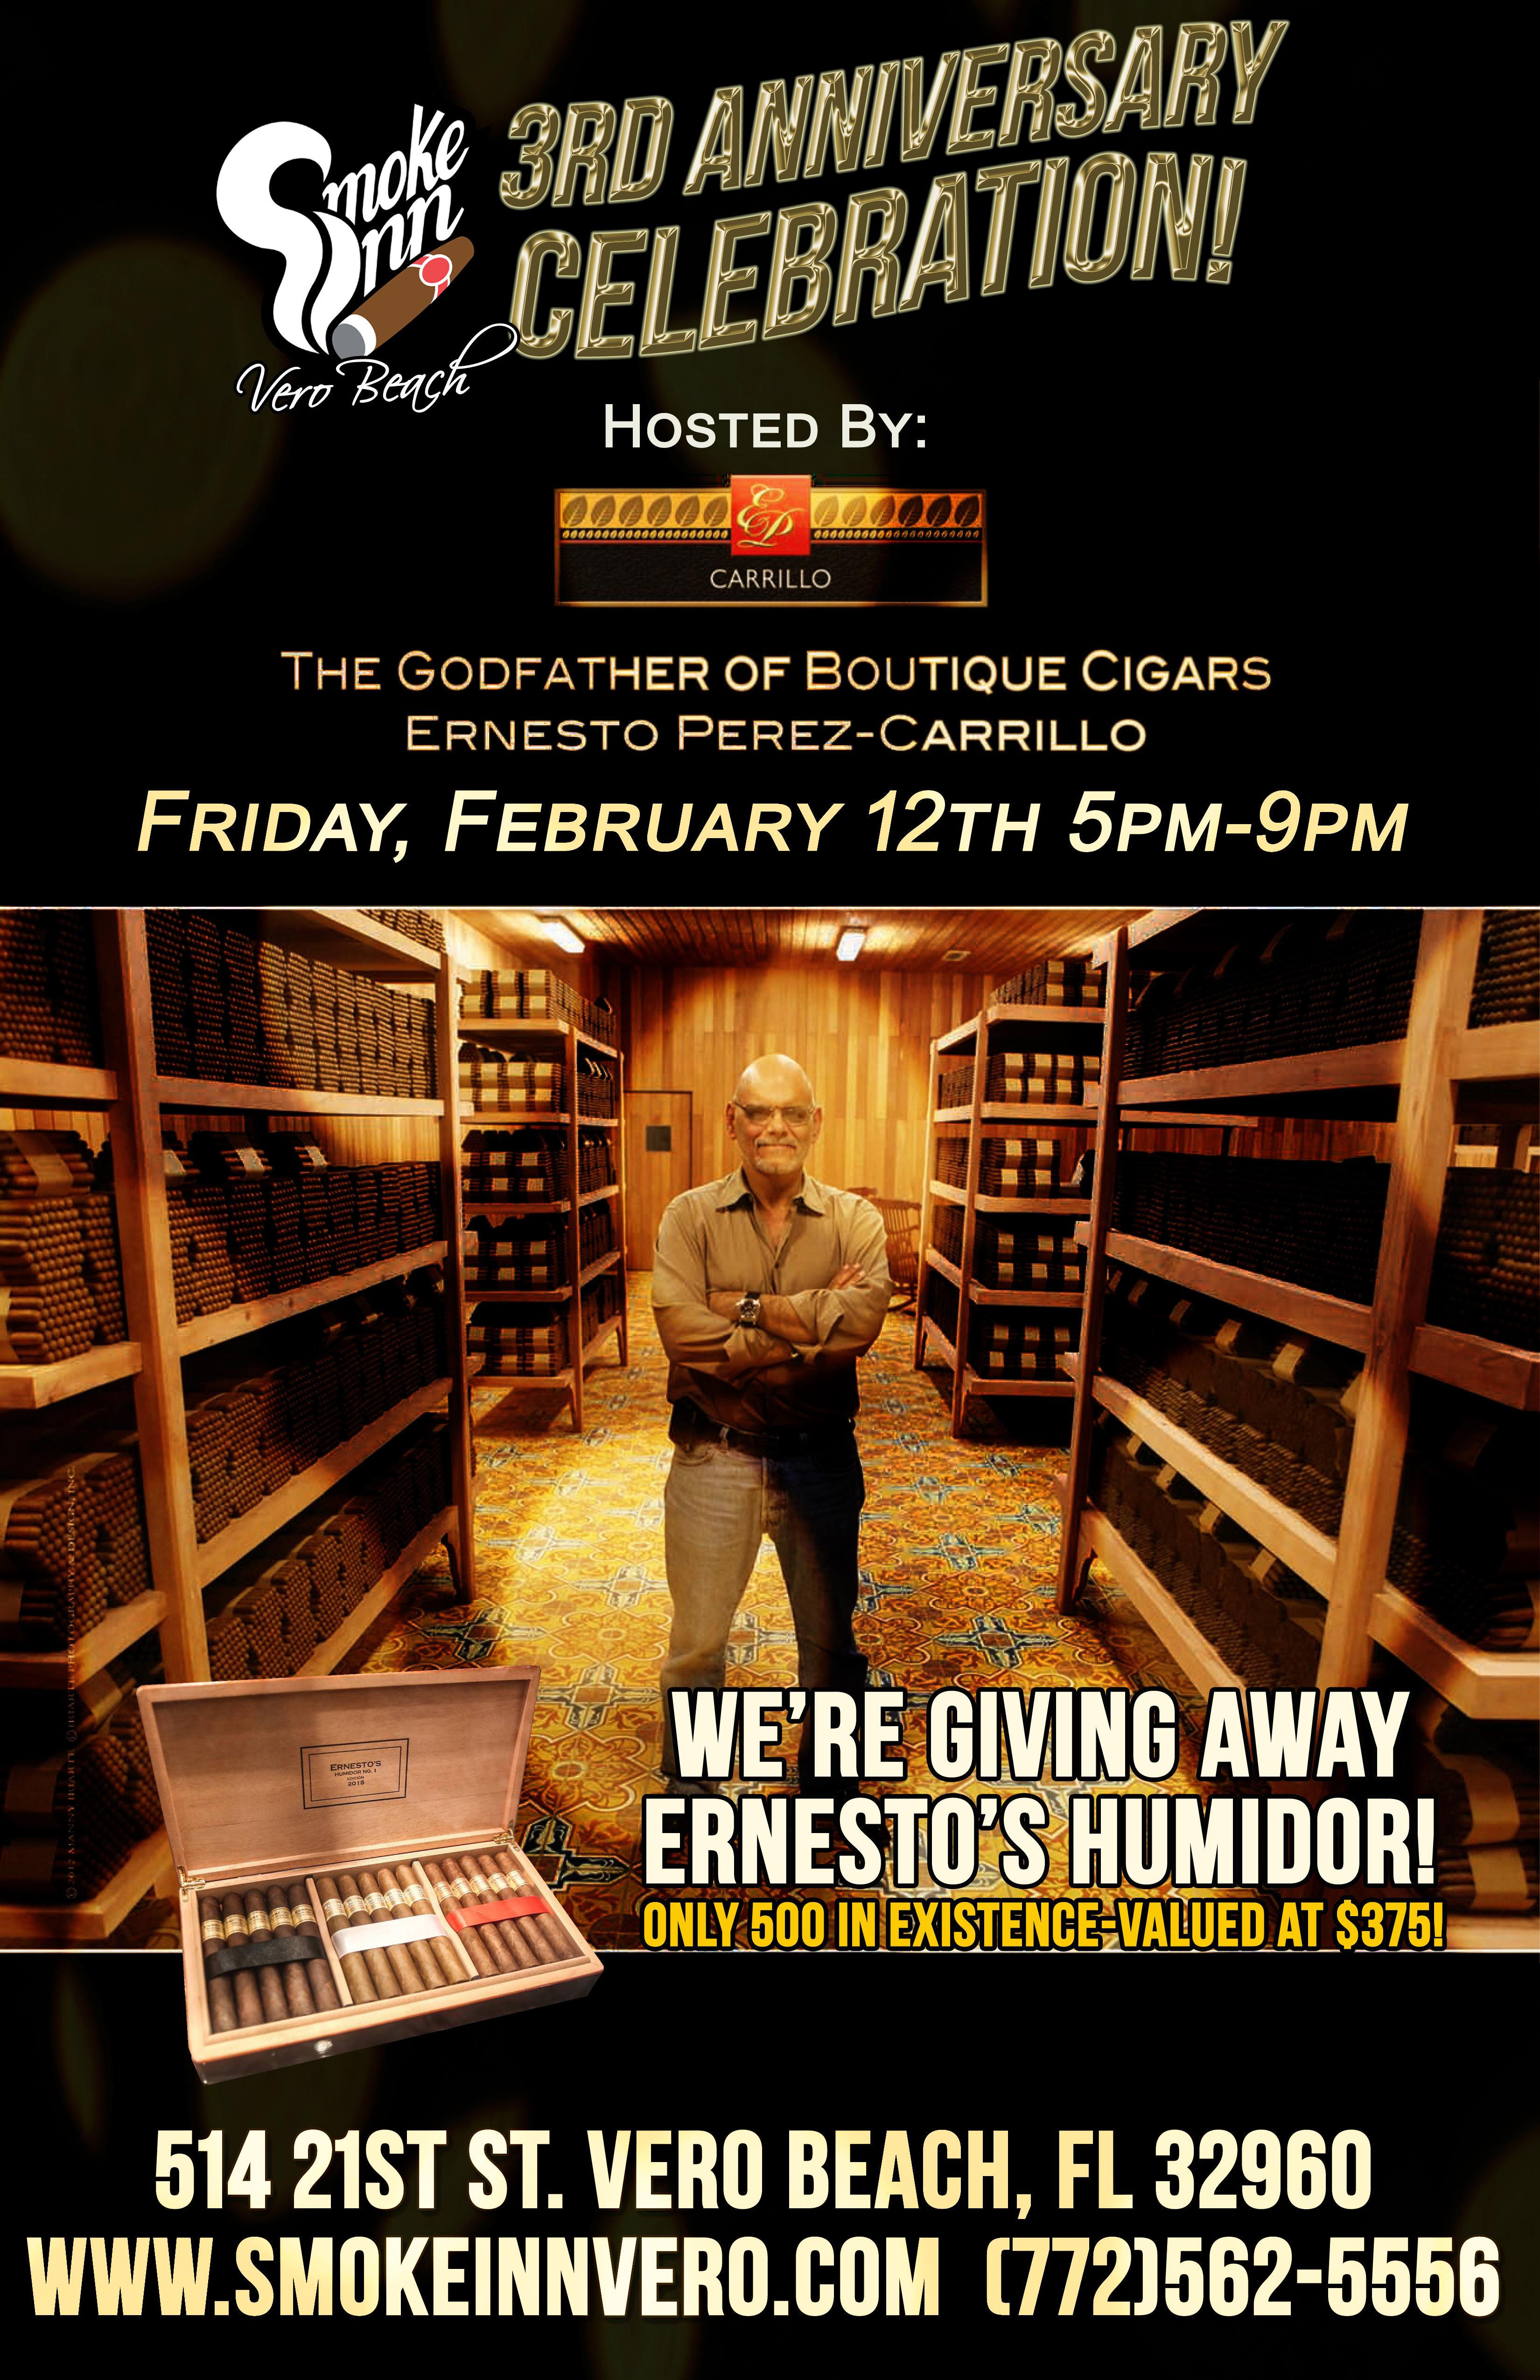 Smoke Inn Cigars Vero Beach_3rd Anniversary hosted by_Ernesto Perez-Carrillo